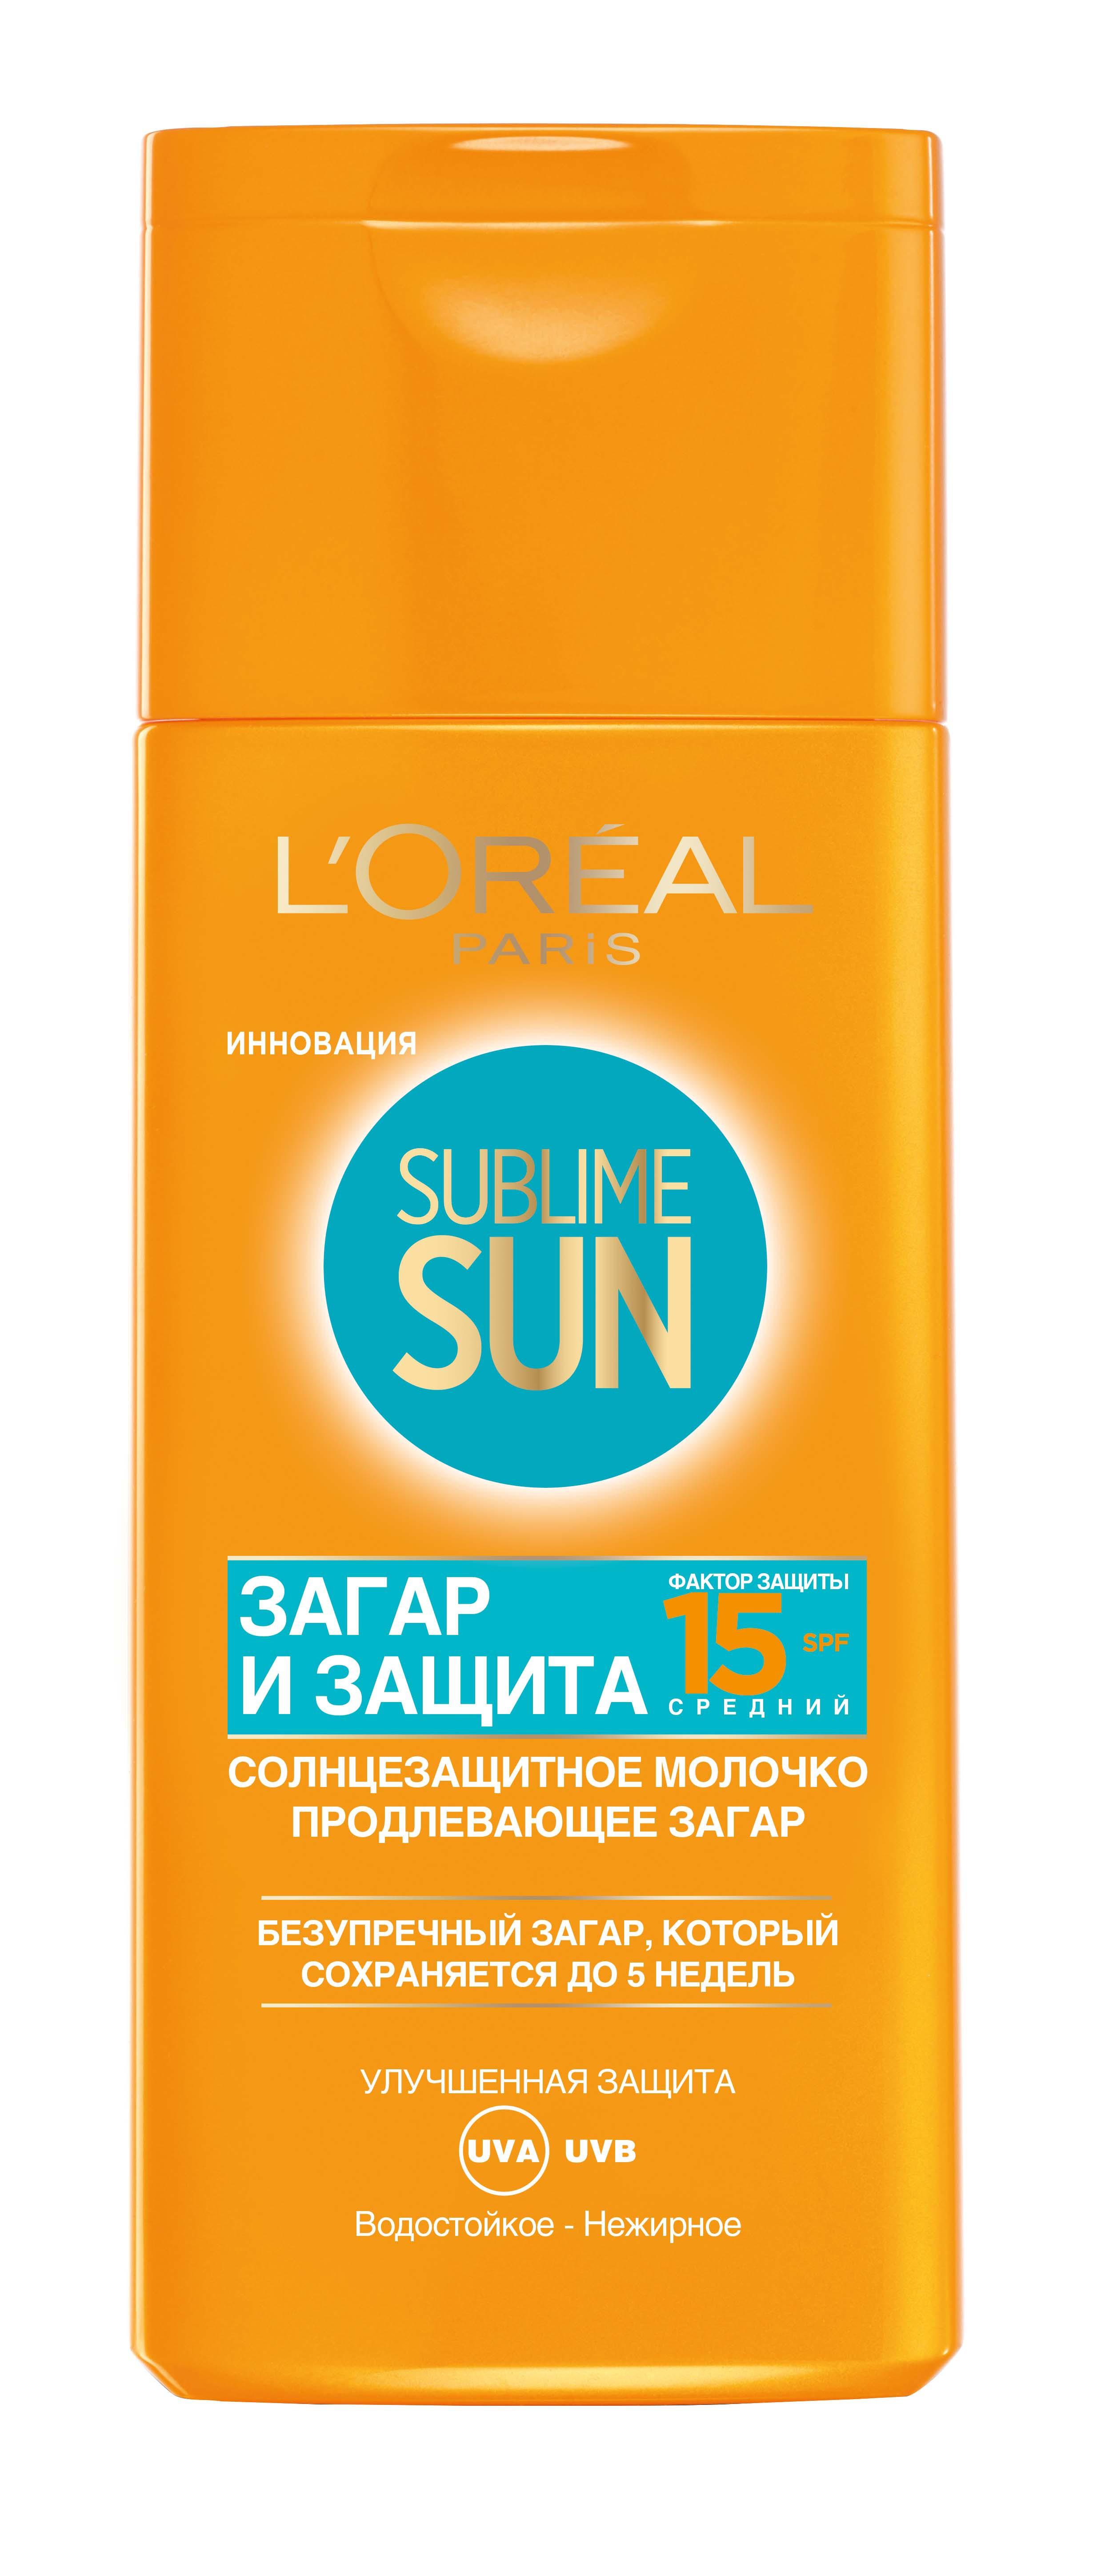 "L'Oreal Paris Sublime Sun Молочко для тела ""Загар и Защита"", солнцезащитное, SPF15, 200 мл A8667500"